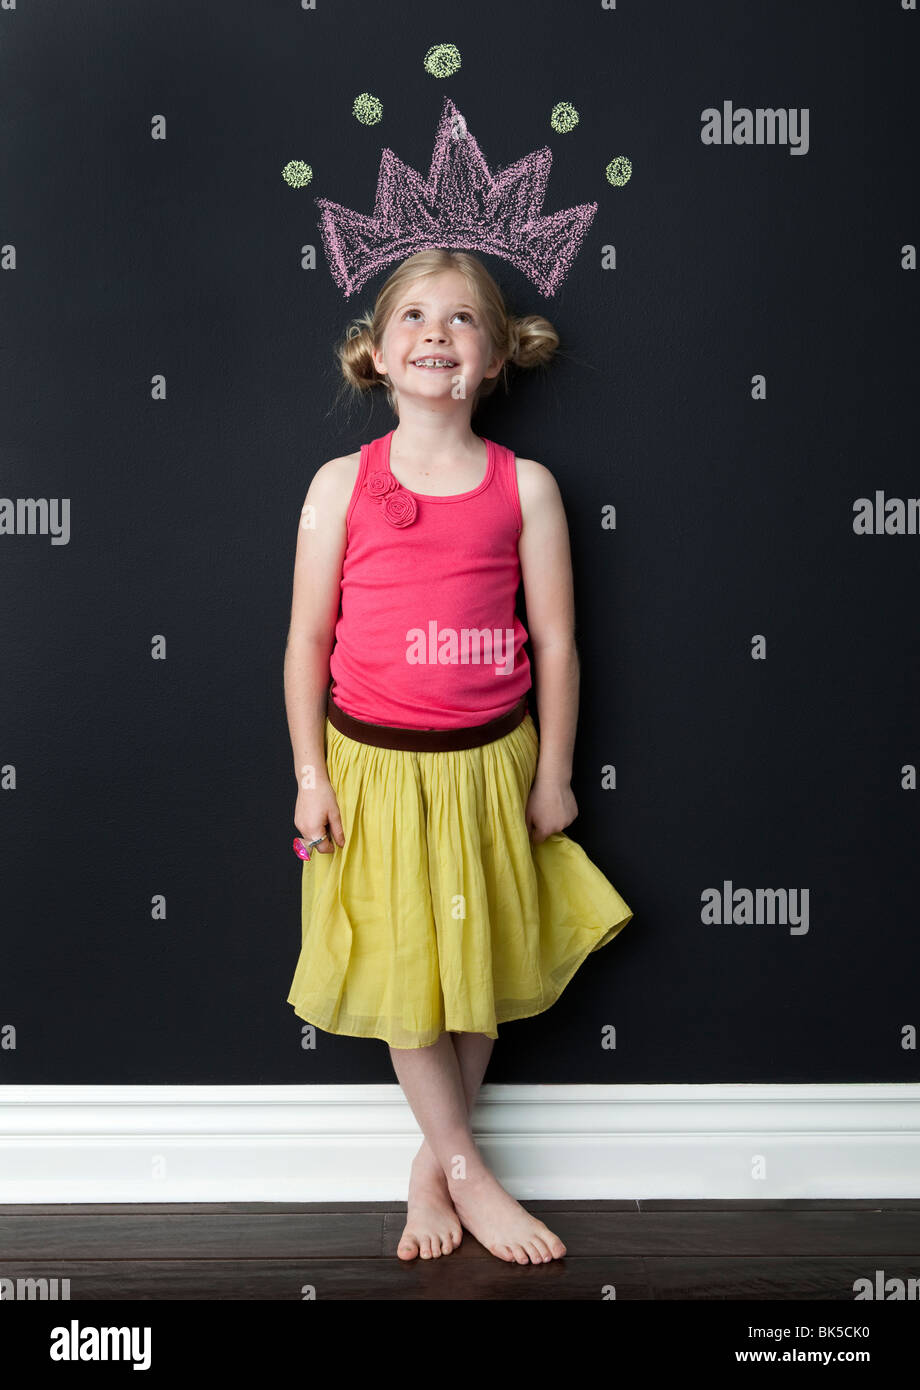 Girl posing beneath princess crown - Stock Image